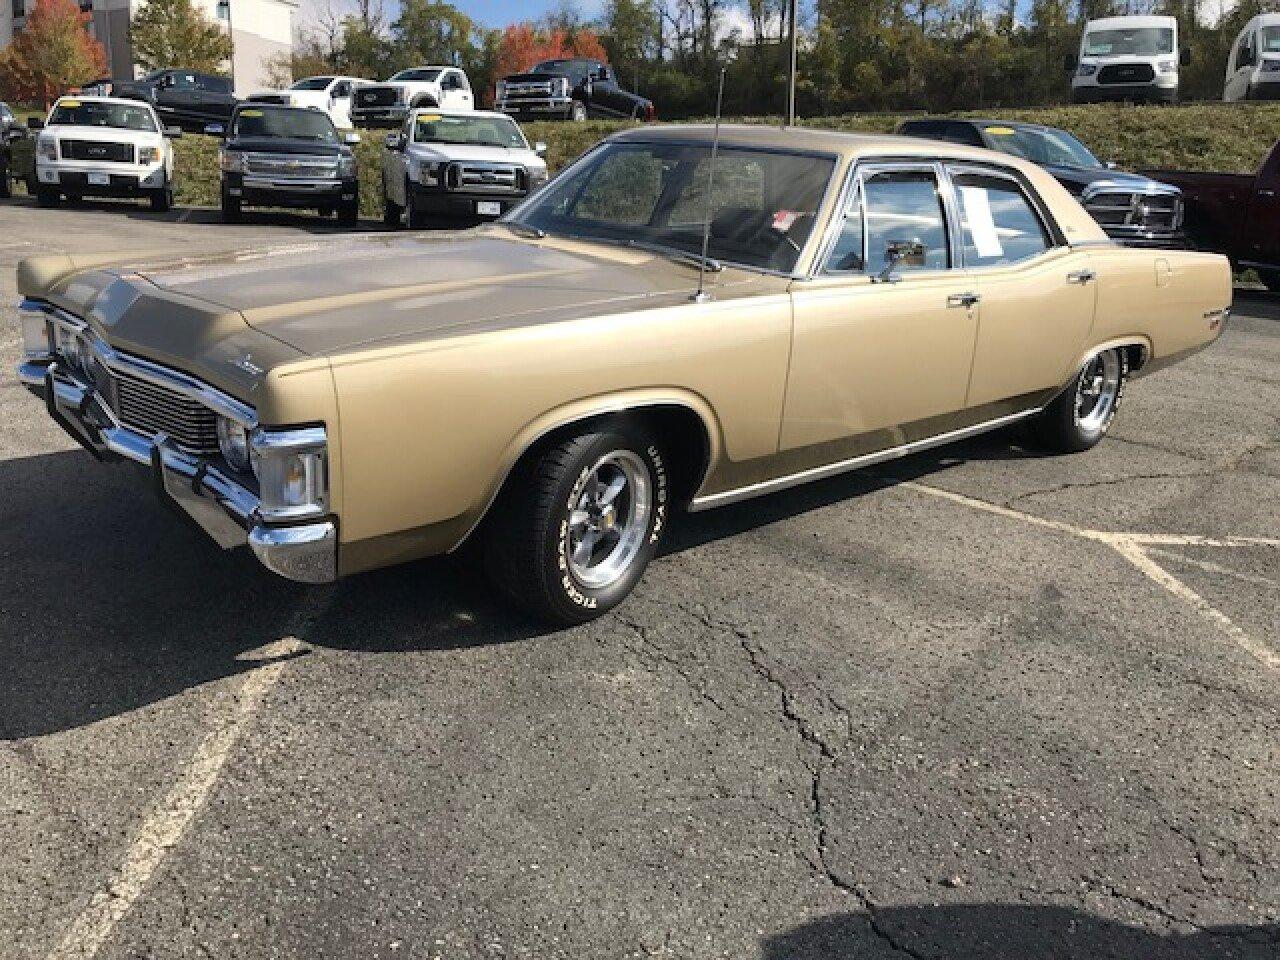 1969 Mercury Monterey for sale near Pittsburgh, Pennsylvania 15236 - Classics on Autotrader